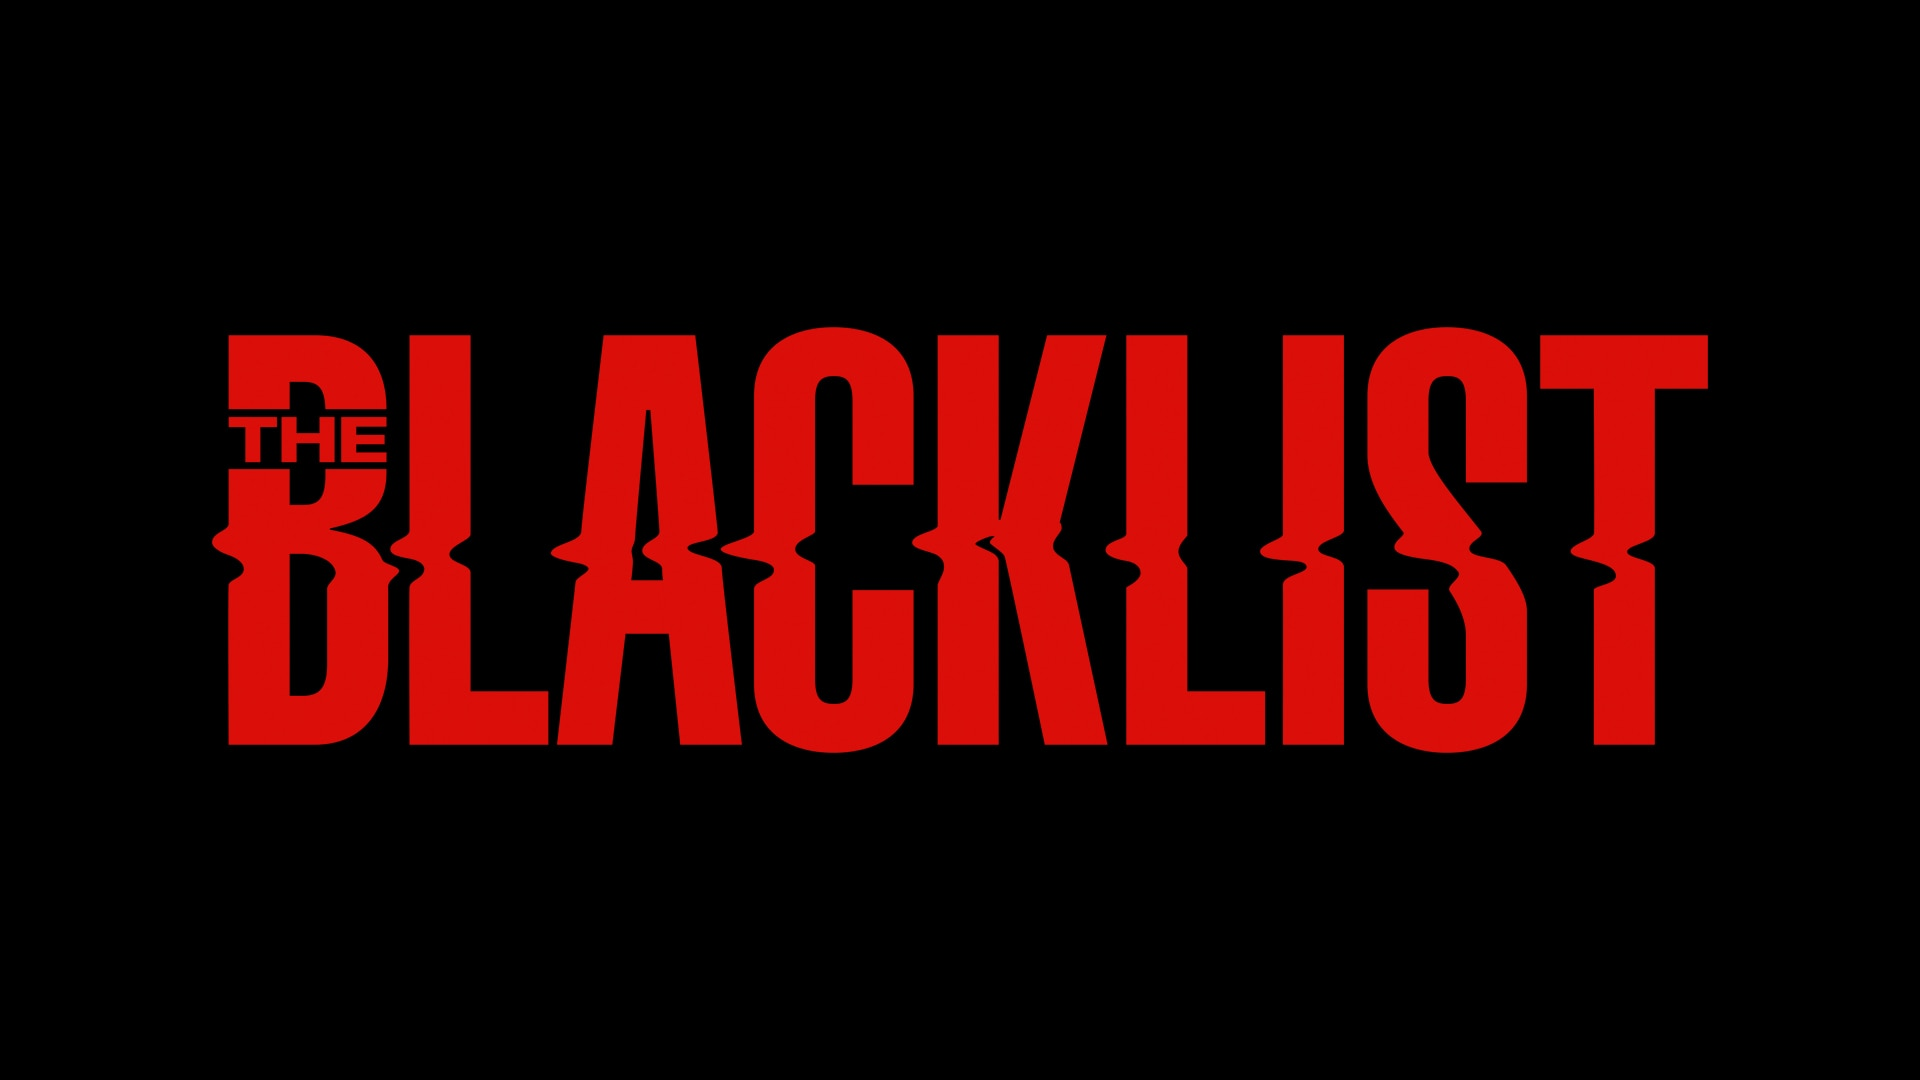 The Blacklist - NBC com